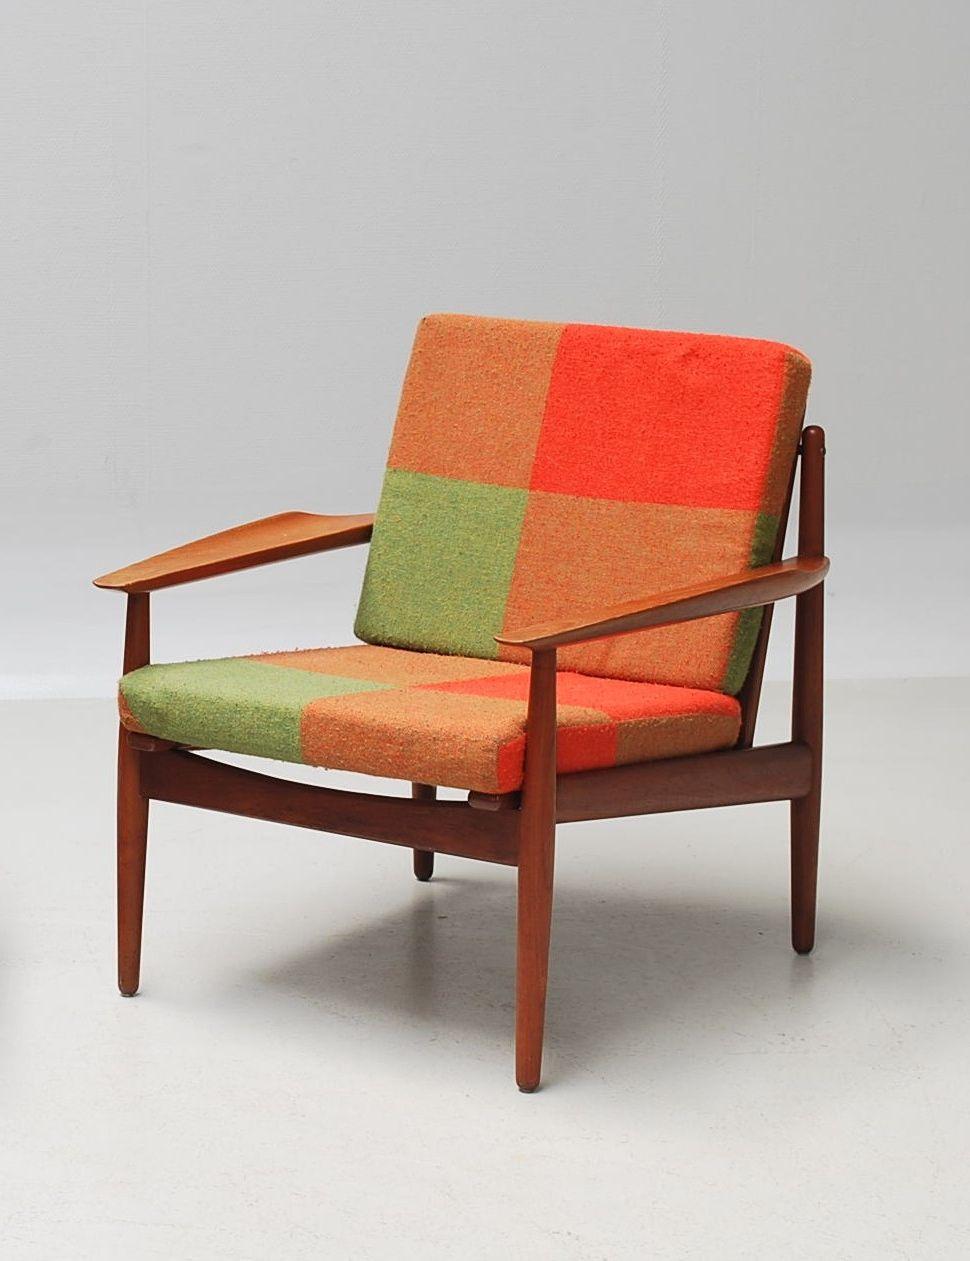 Grete Jalk Teak Lounge Chair For Glostrup Møbelfabrik 1950s